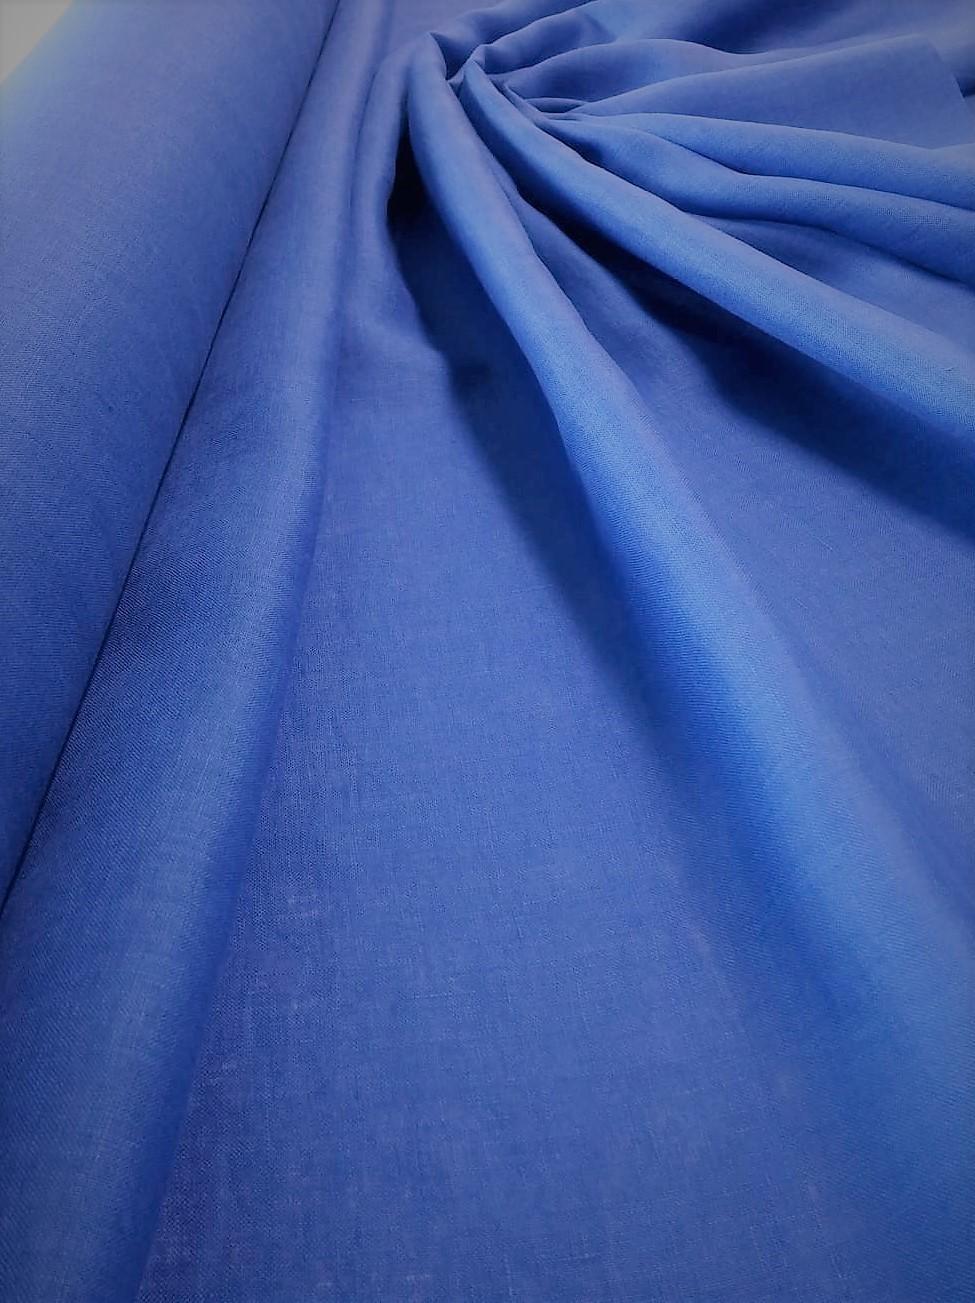 modrý len   Zboží prodejce Solidus Brno  c3364dfbc6d